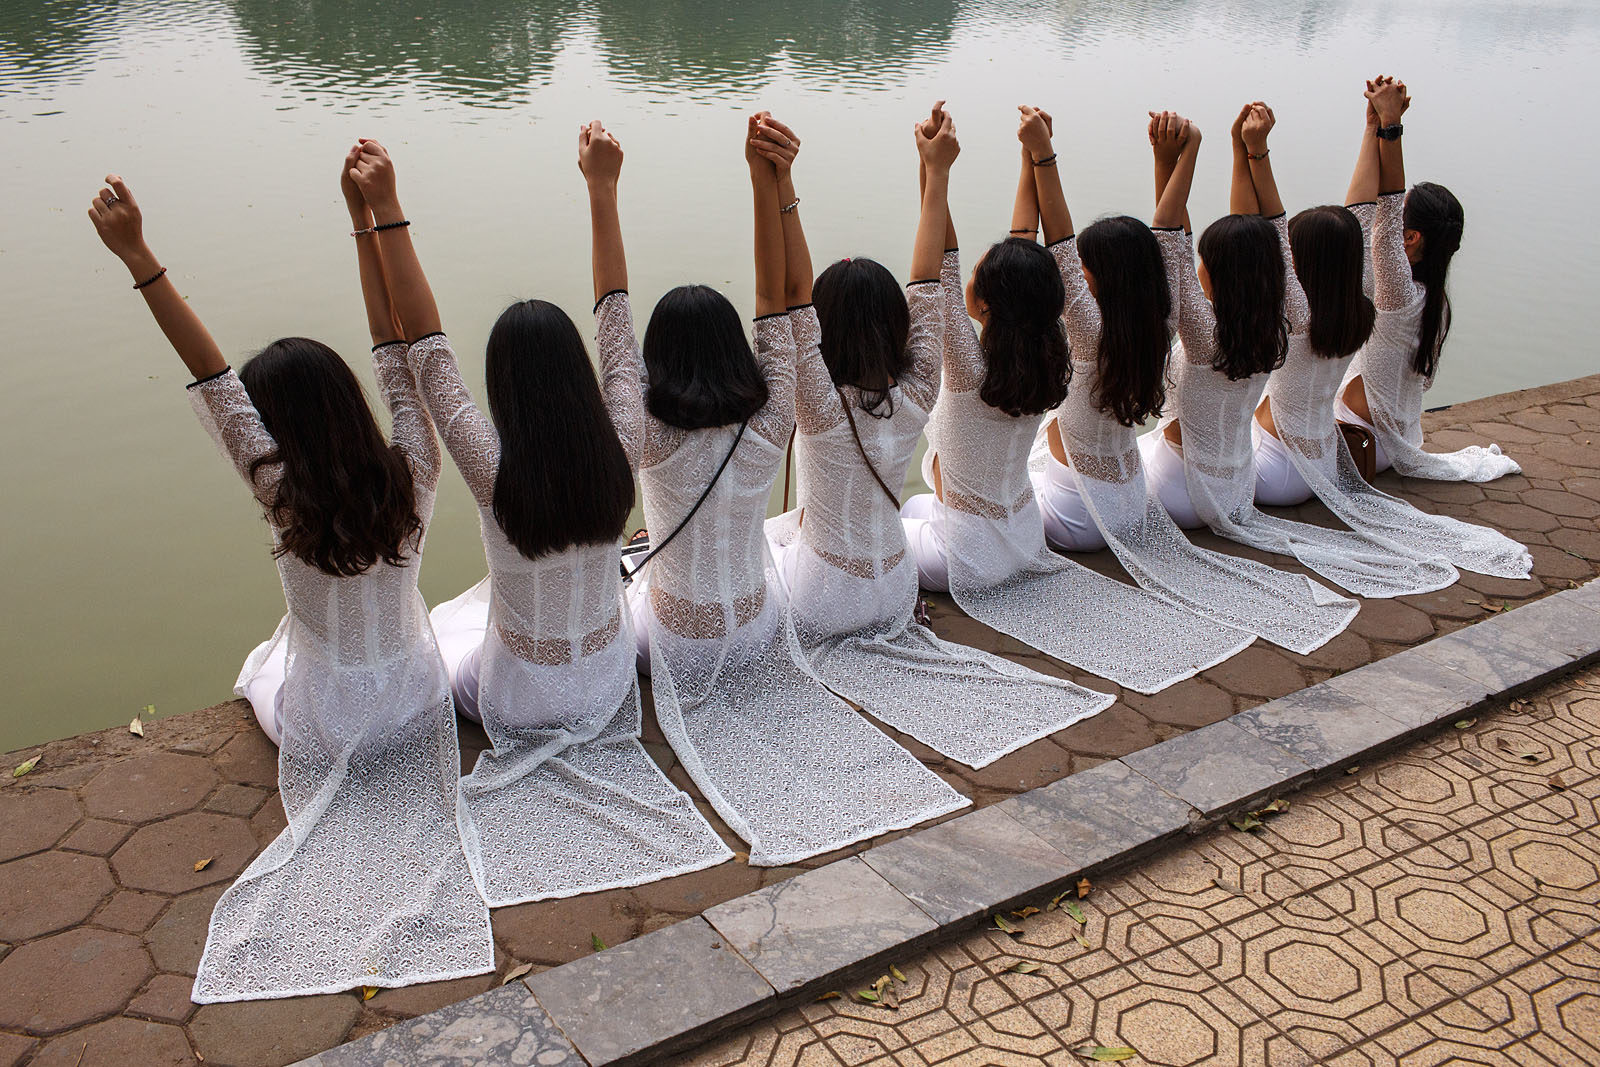 vietnam_hanoi_city_Hoan_Kiem_Lake_women_girls_students_ao_dai_water_travel_photography-1600x1067.jpg